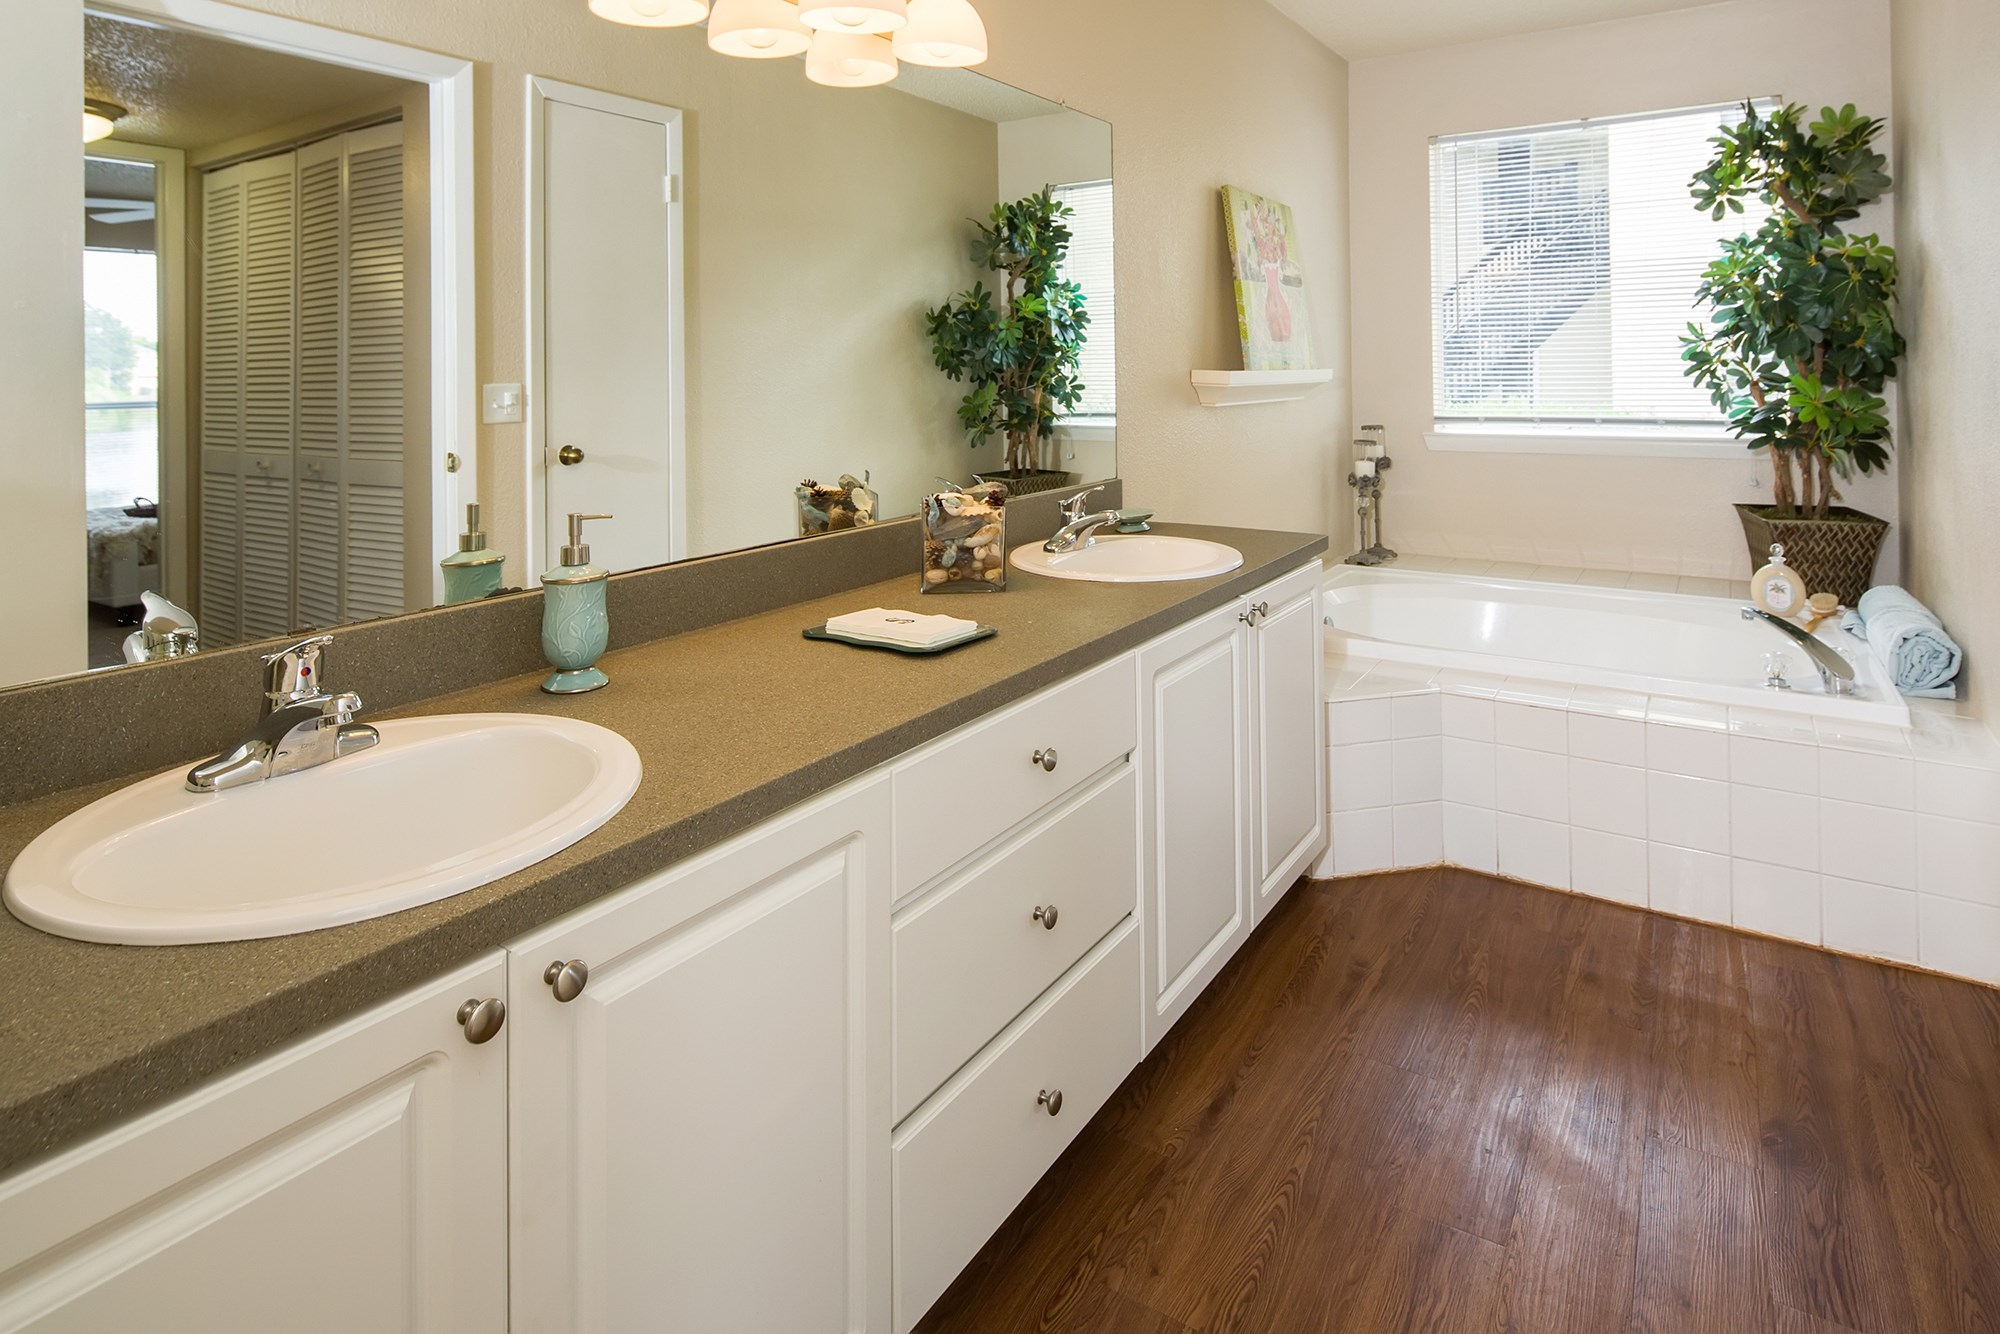 Bathroom at Sawgrass Cove Apartments in Bradenton, FL